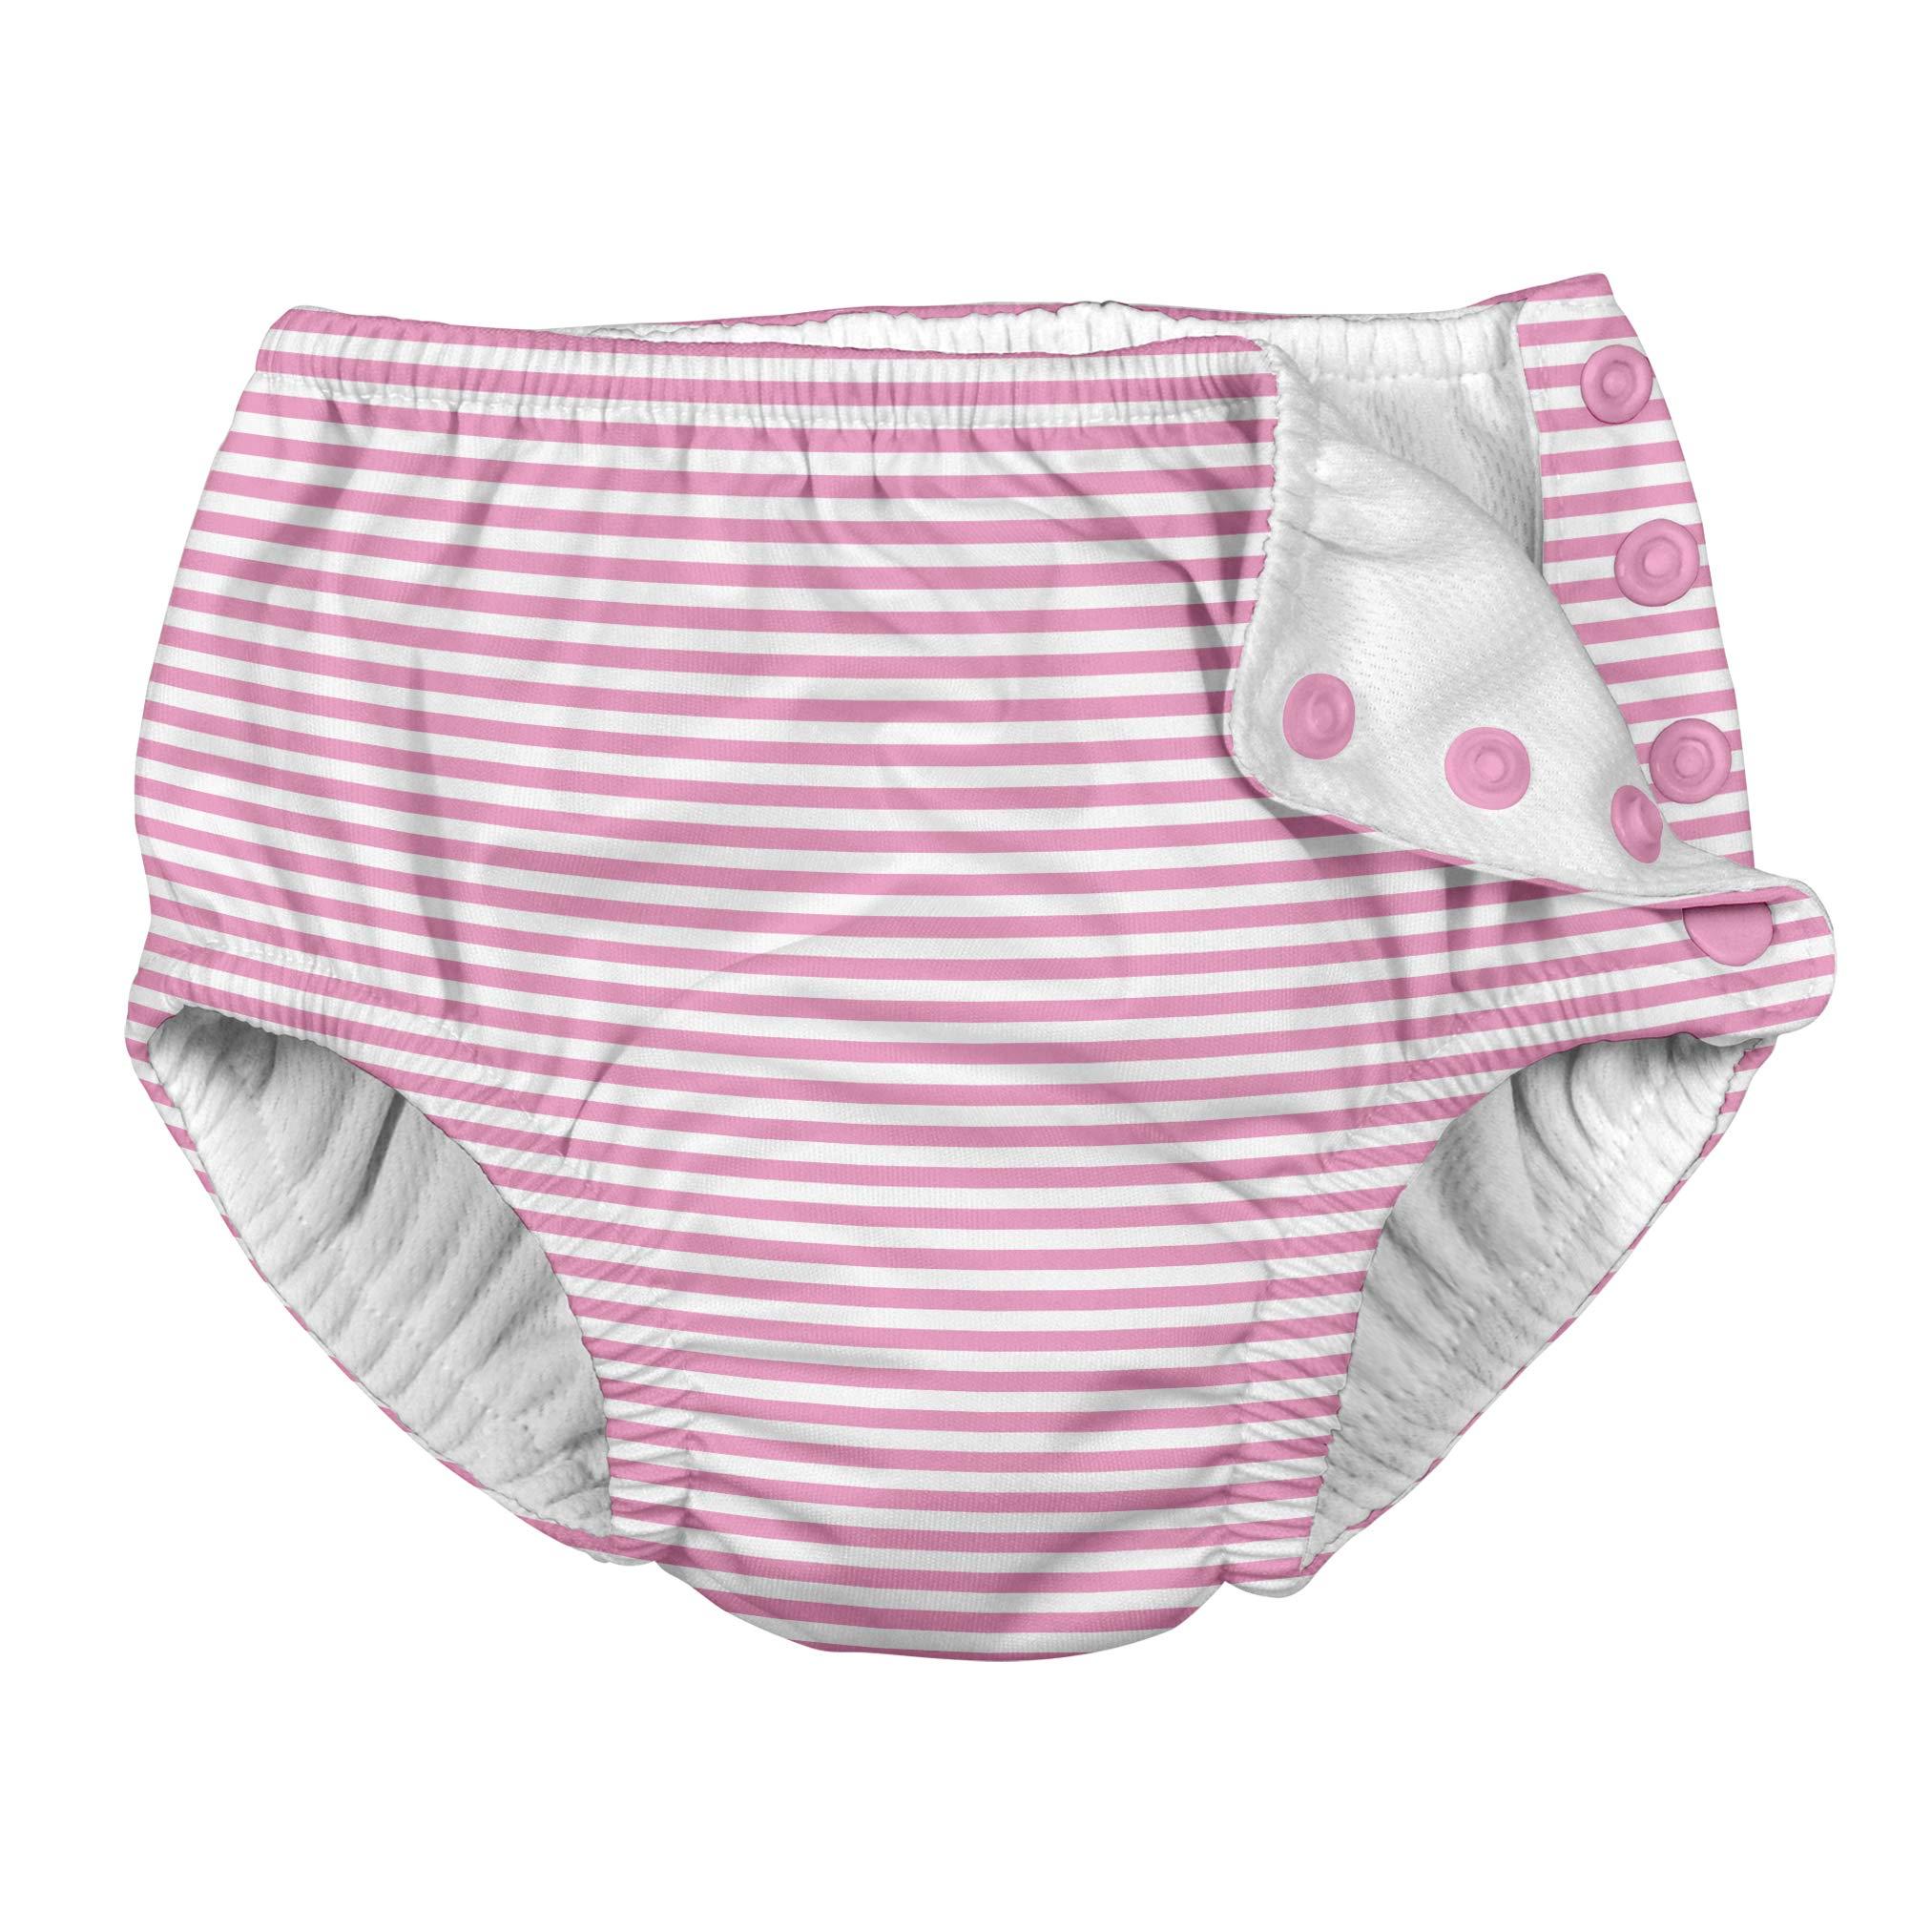 i play. Baby Toddler Girls' Snap Reusable Absorbent